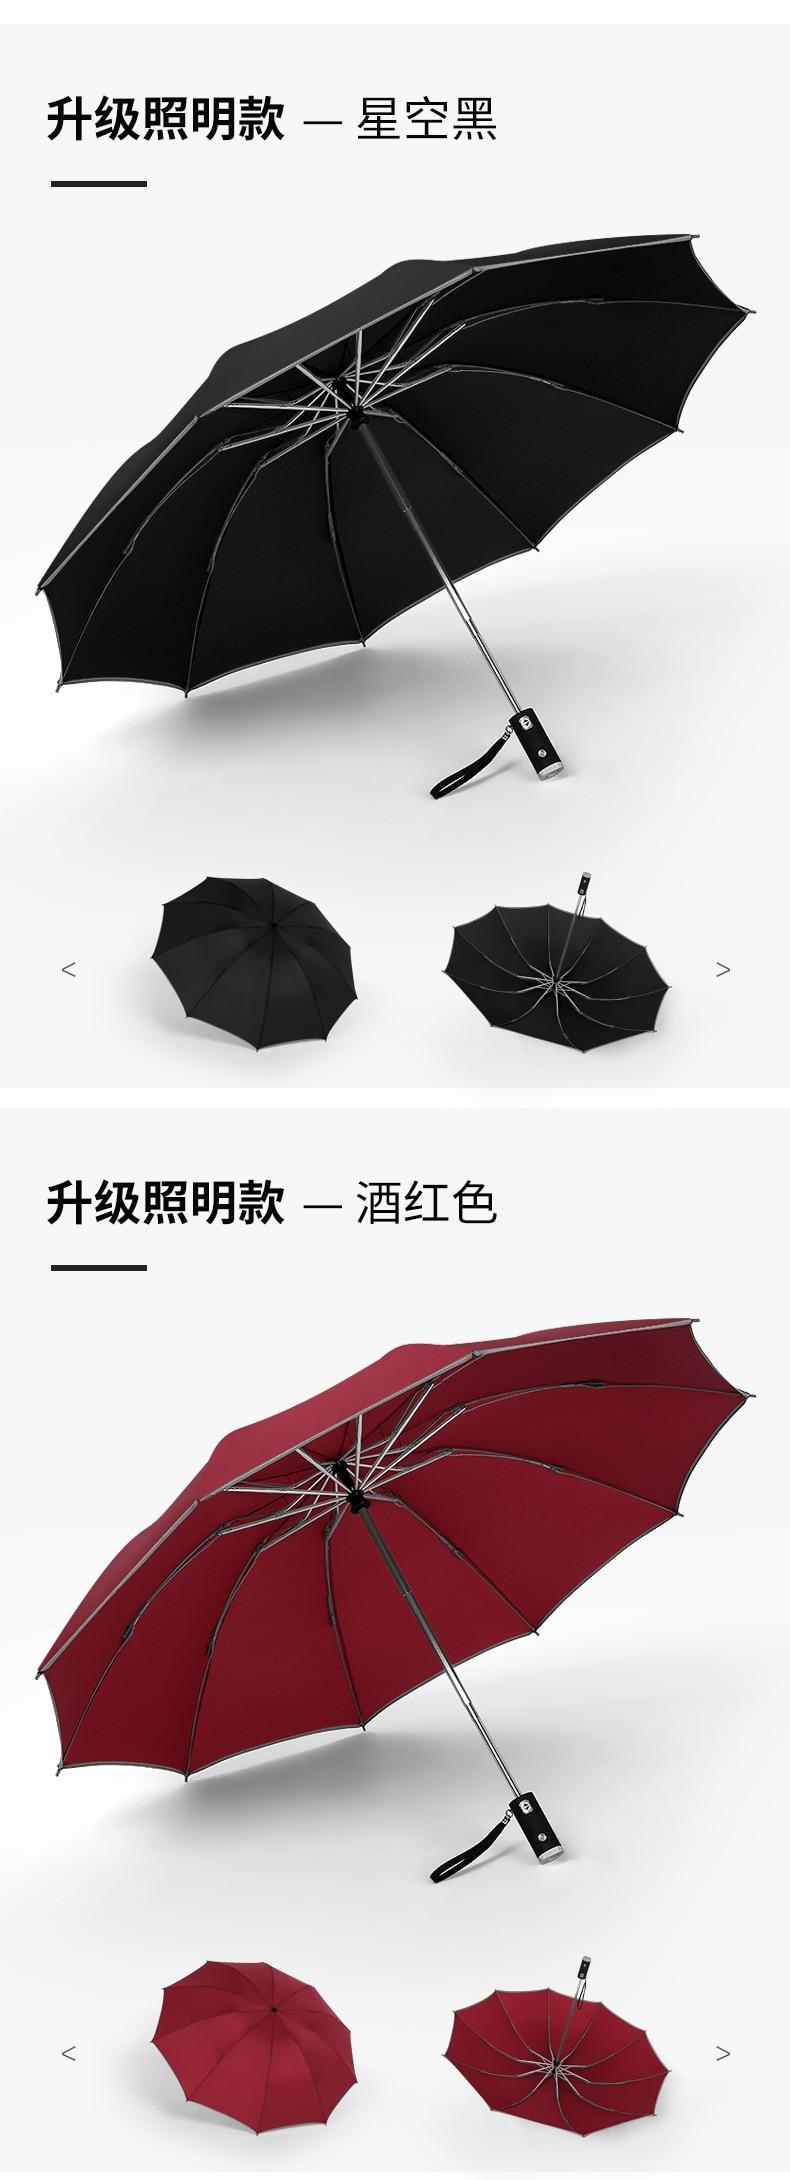 ZGHYBD LED Inverted Umbrella with Reflective Stripe, Travel Umbrella Auto Openclose Windproof Compact Folding Umbrella, Folding Umbrella with 180 Rotating LED Flashlight Folding Umbrella Green